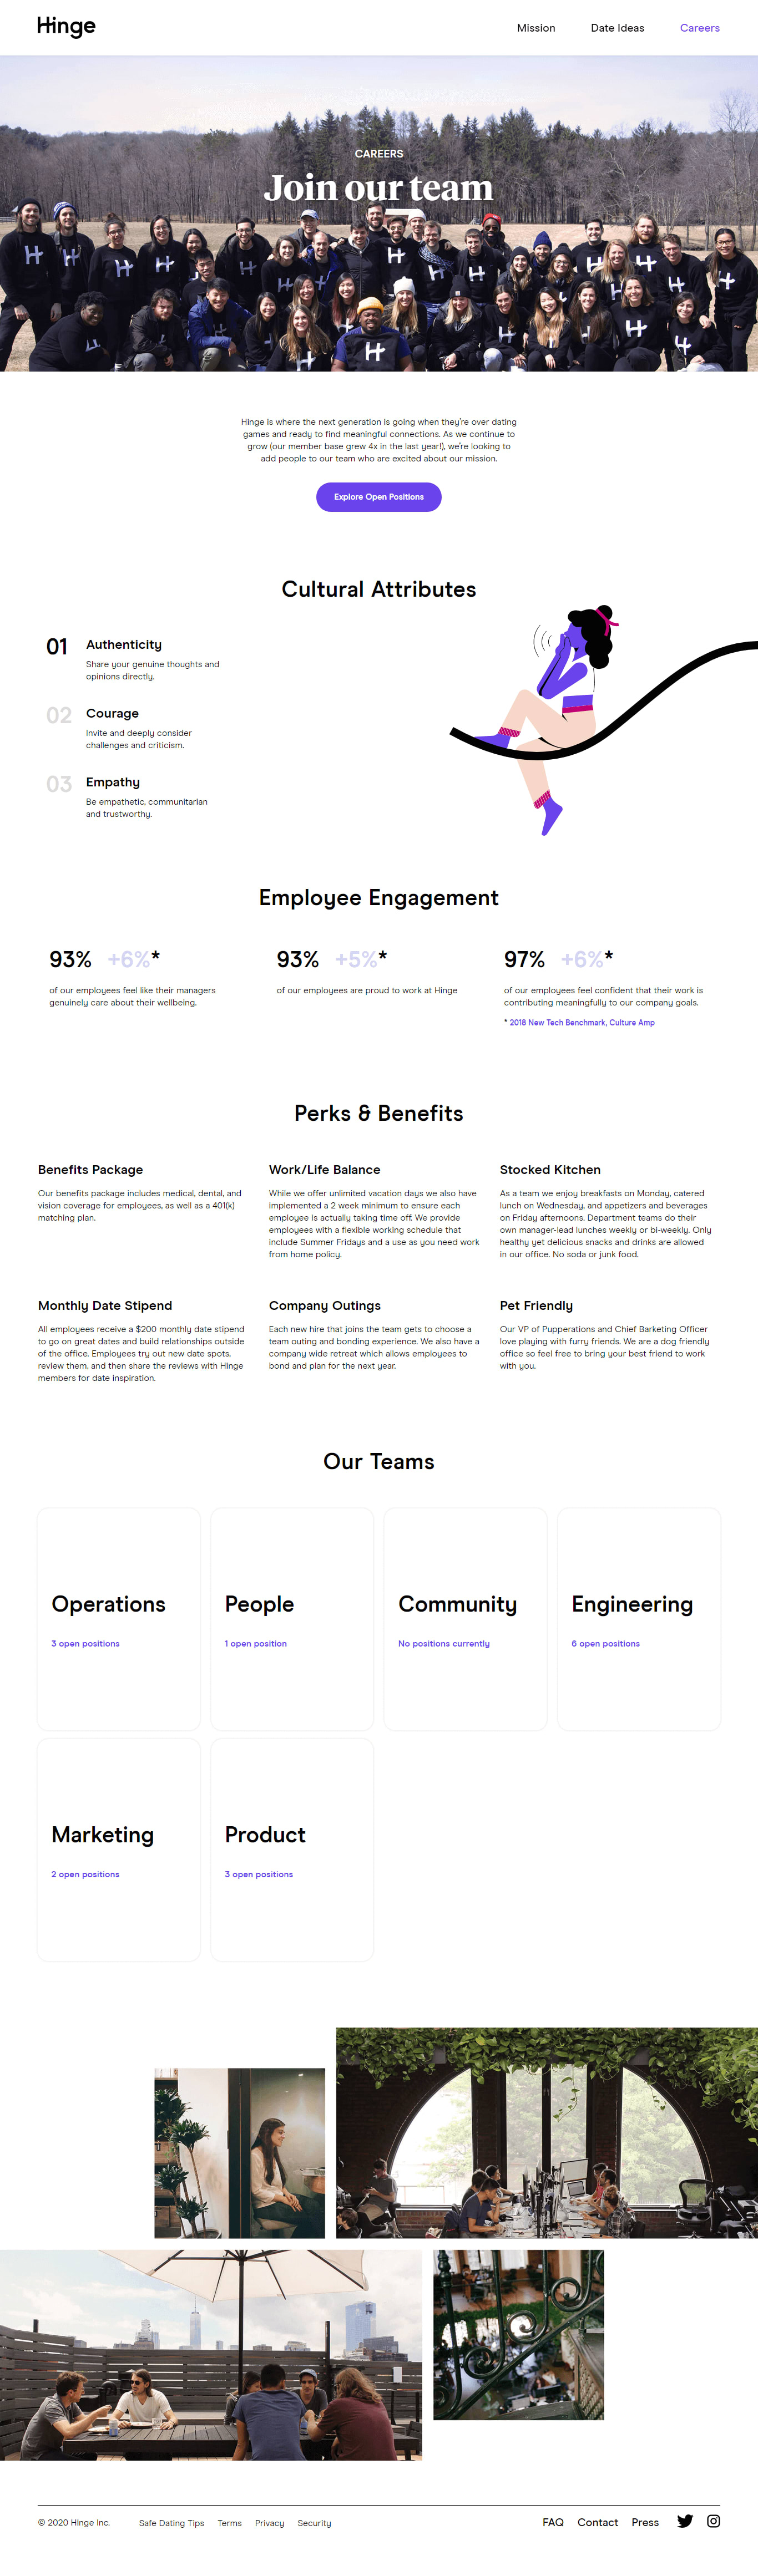 Hinge team and careers page.